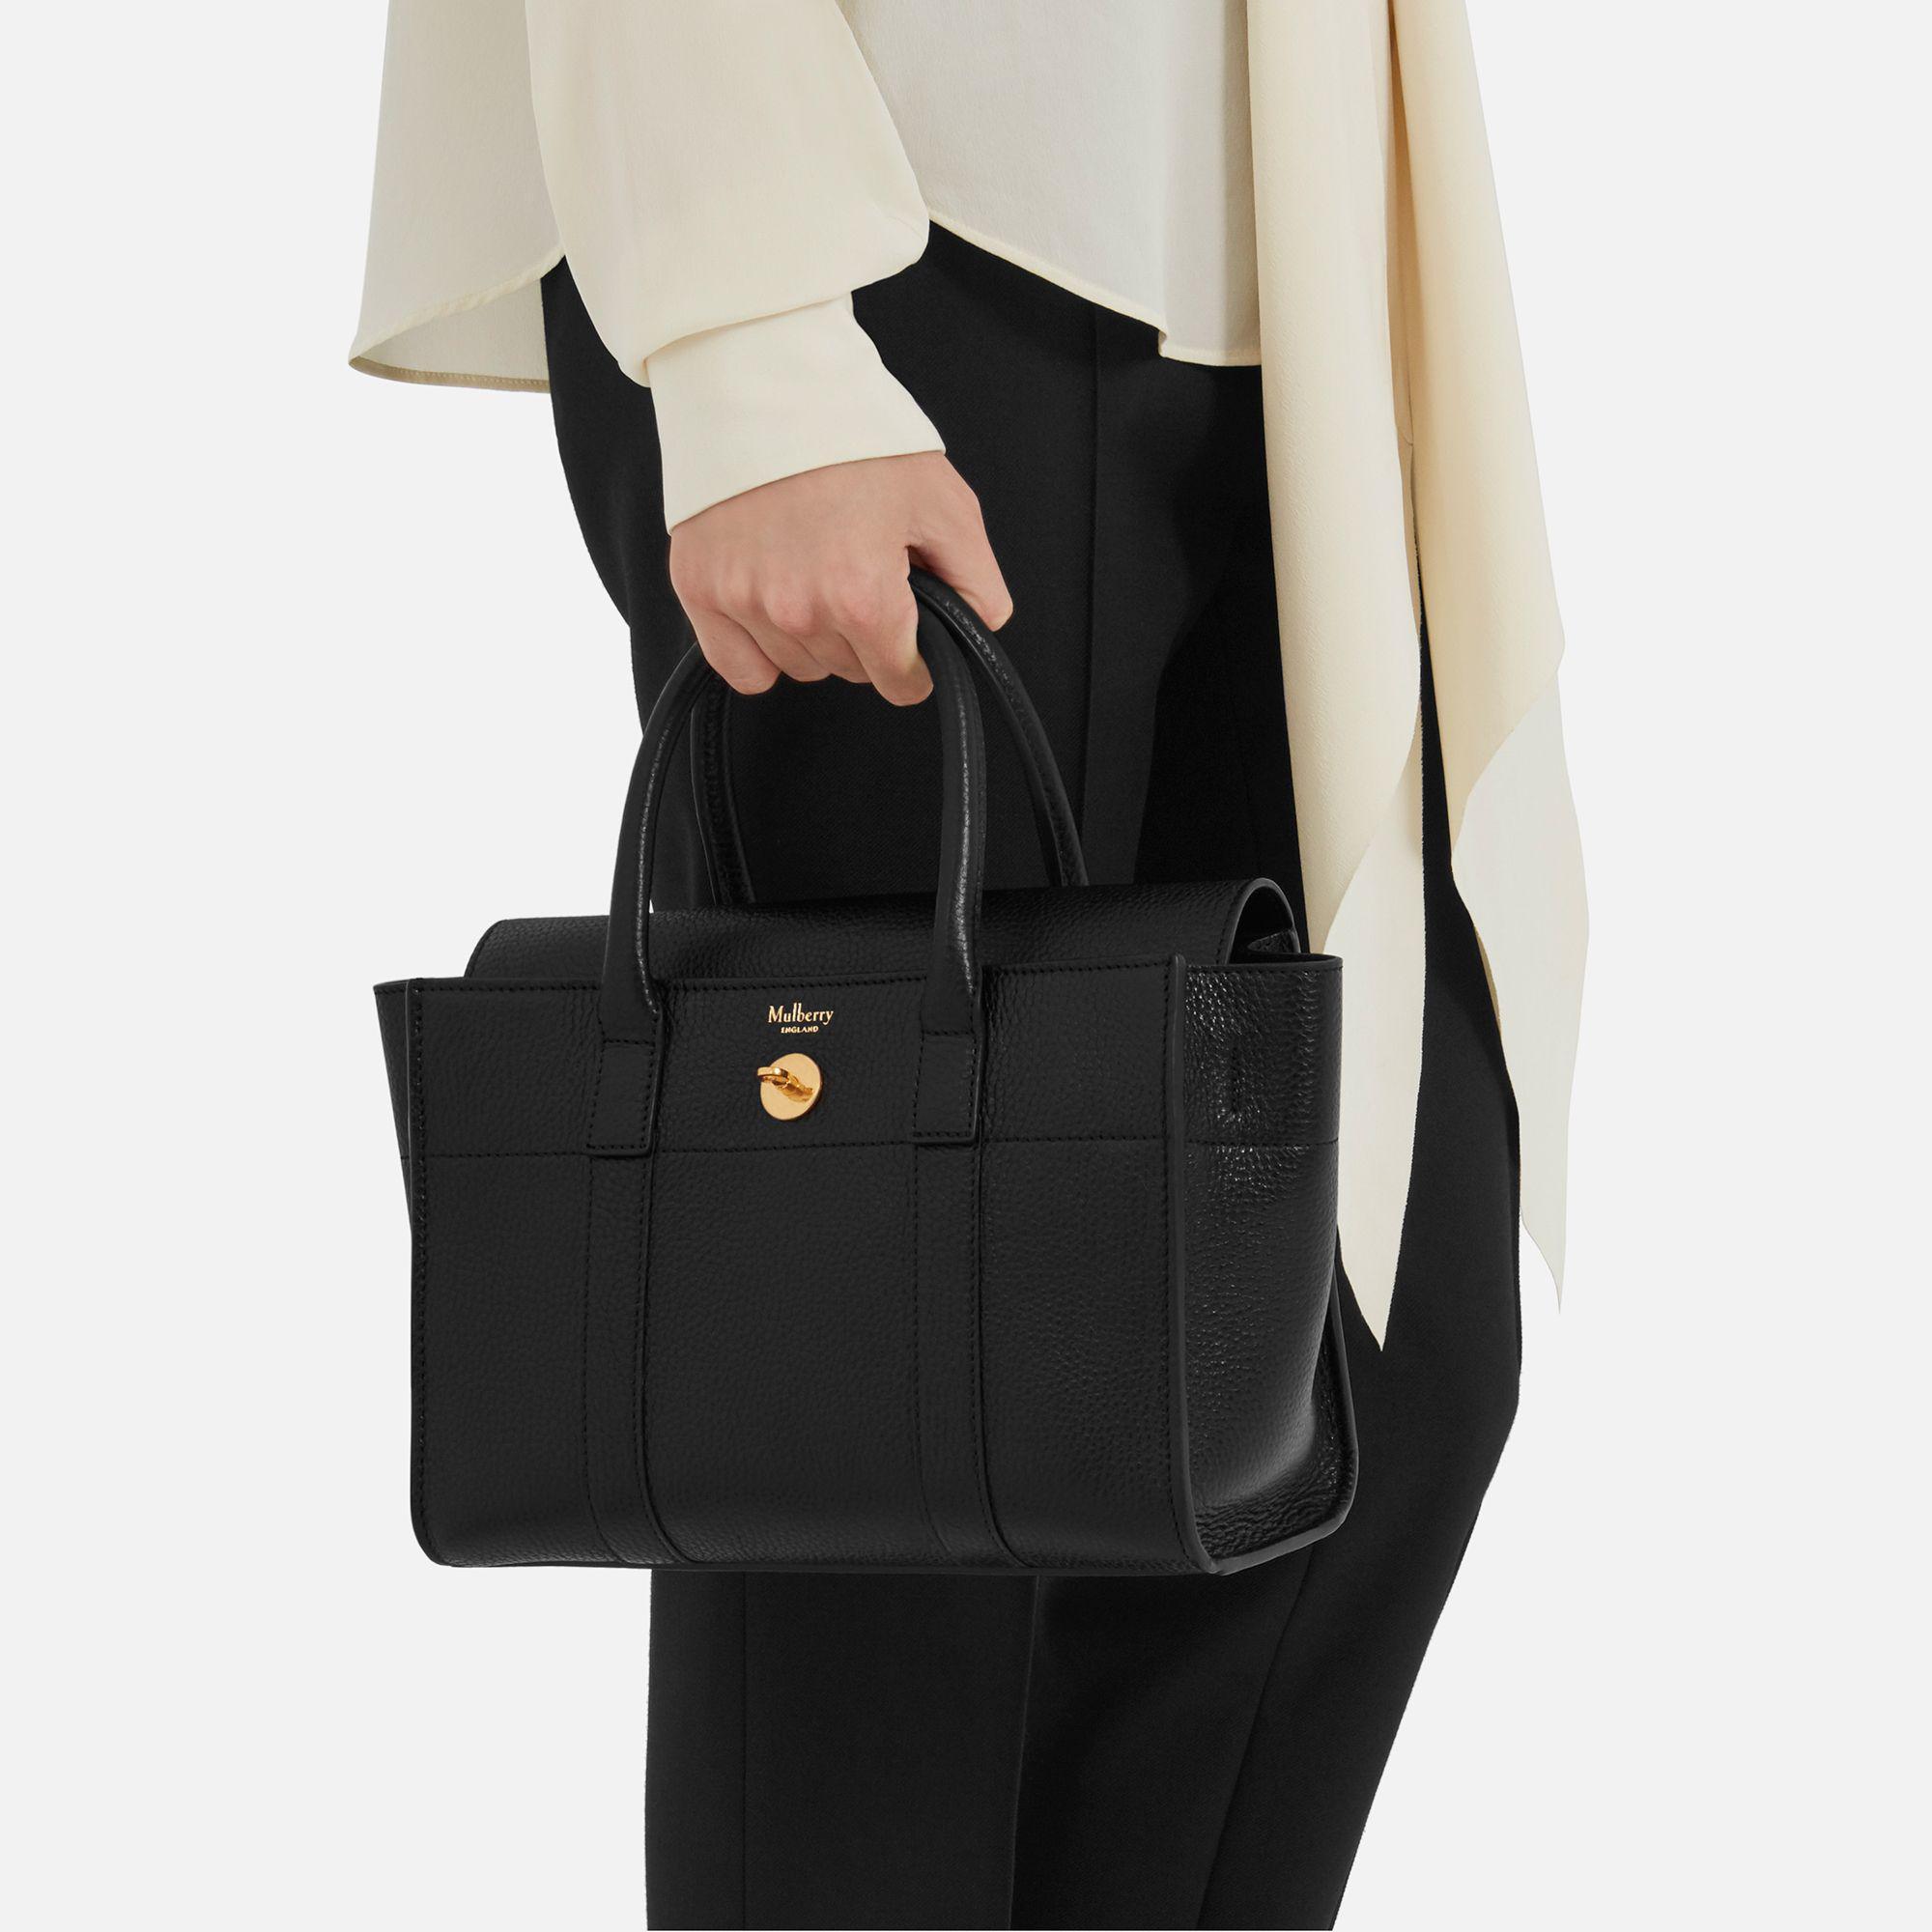 ... wholesale mulberry black small bayswater satchel bag lyst. view  fullscreen f1250 dc18b ... 5db530d40c03a